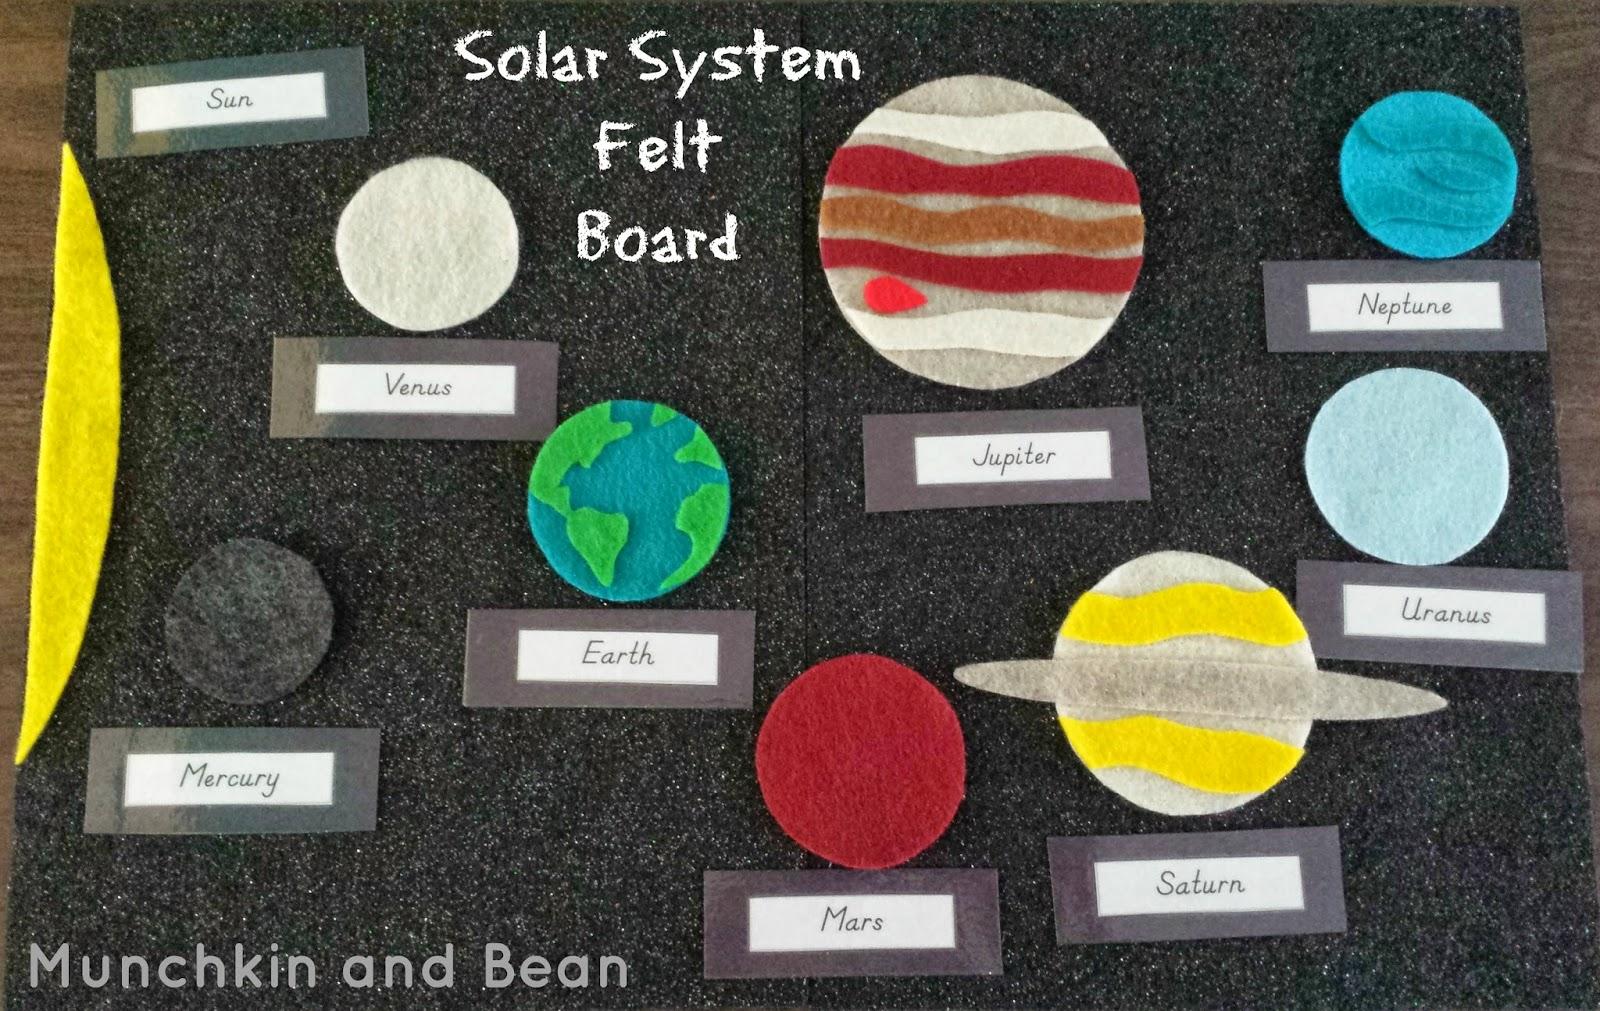 Munchkin and Bean: Solar System Unit Study